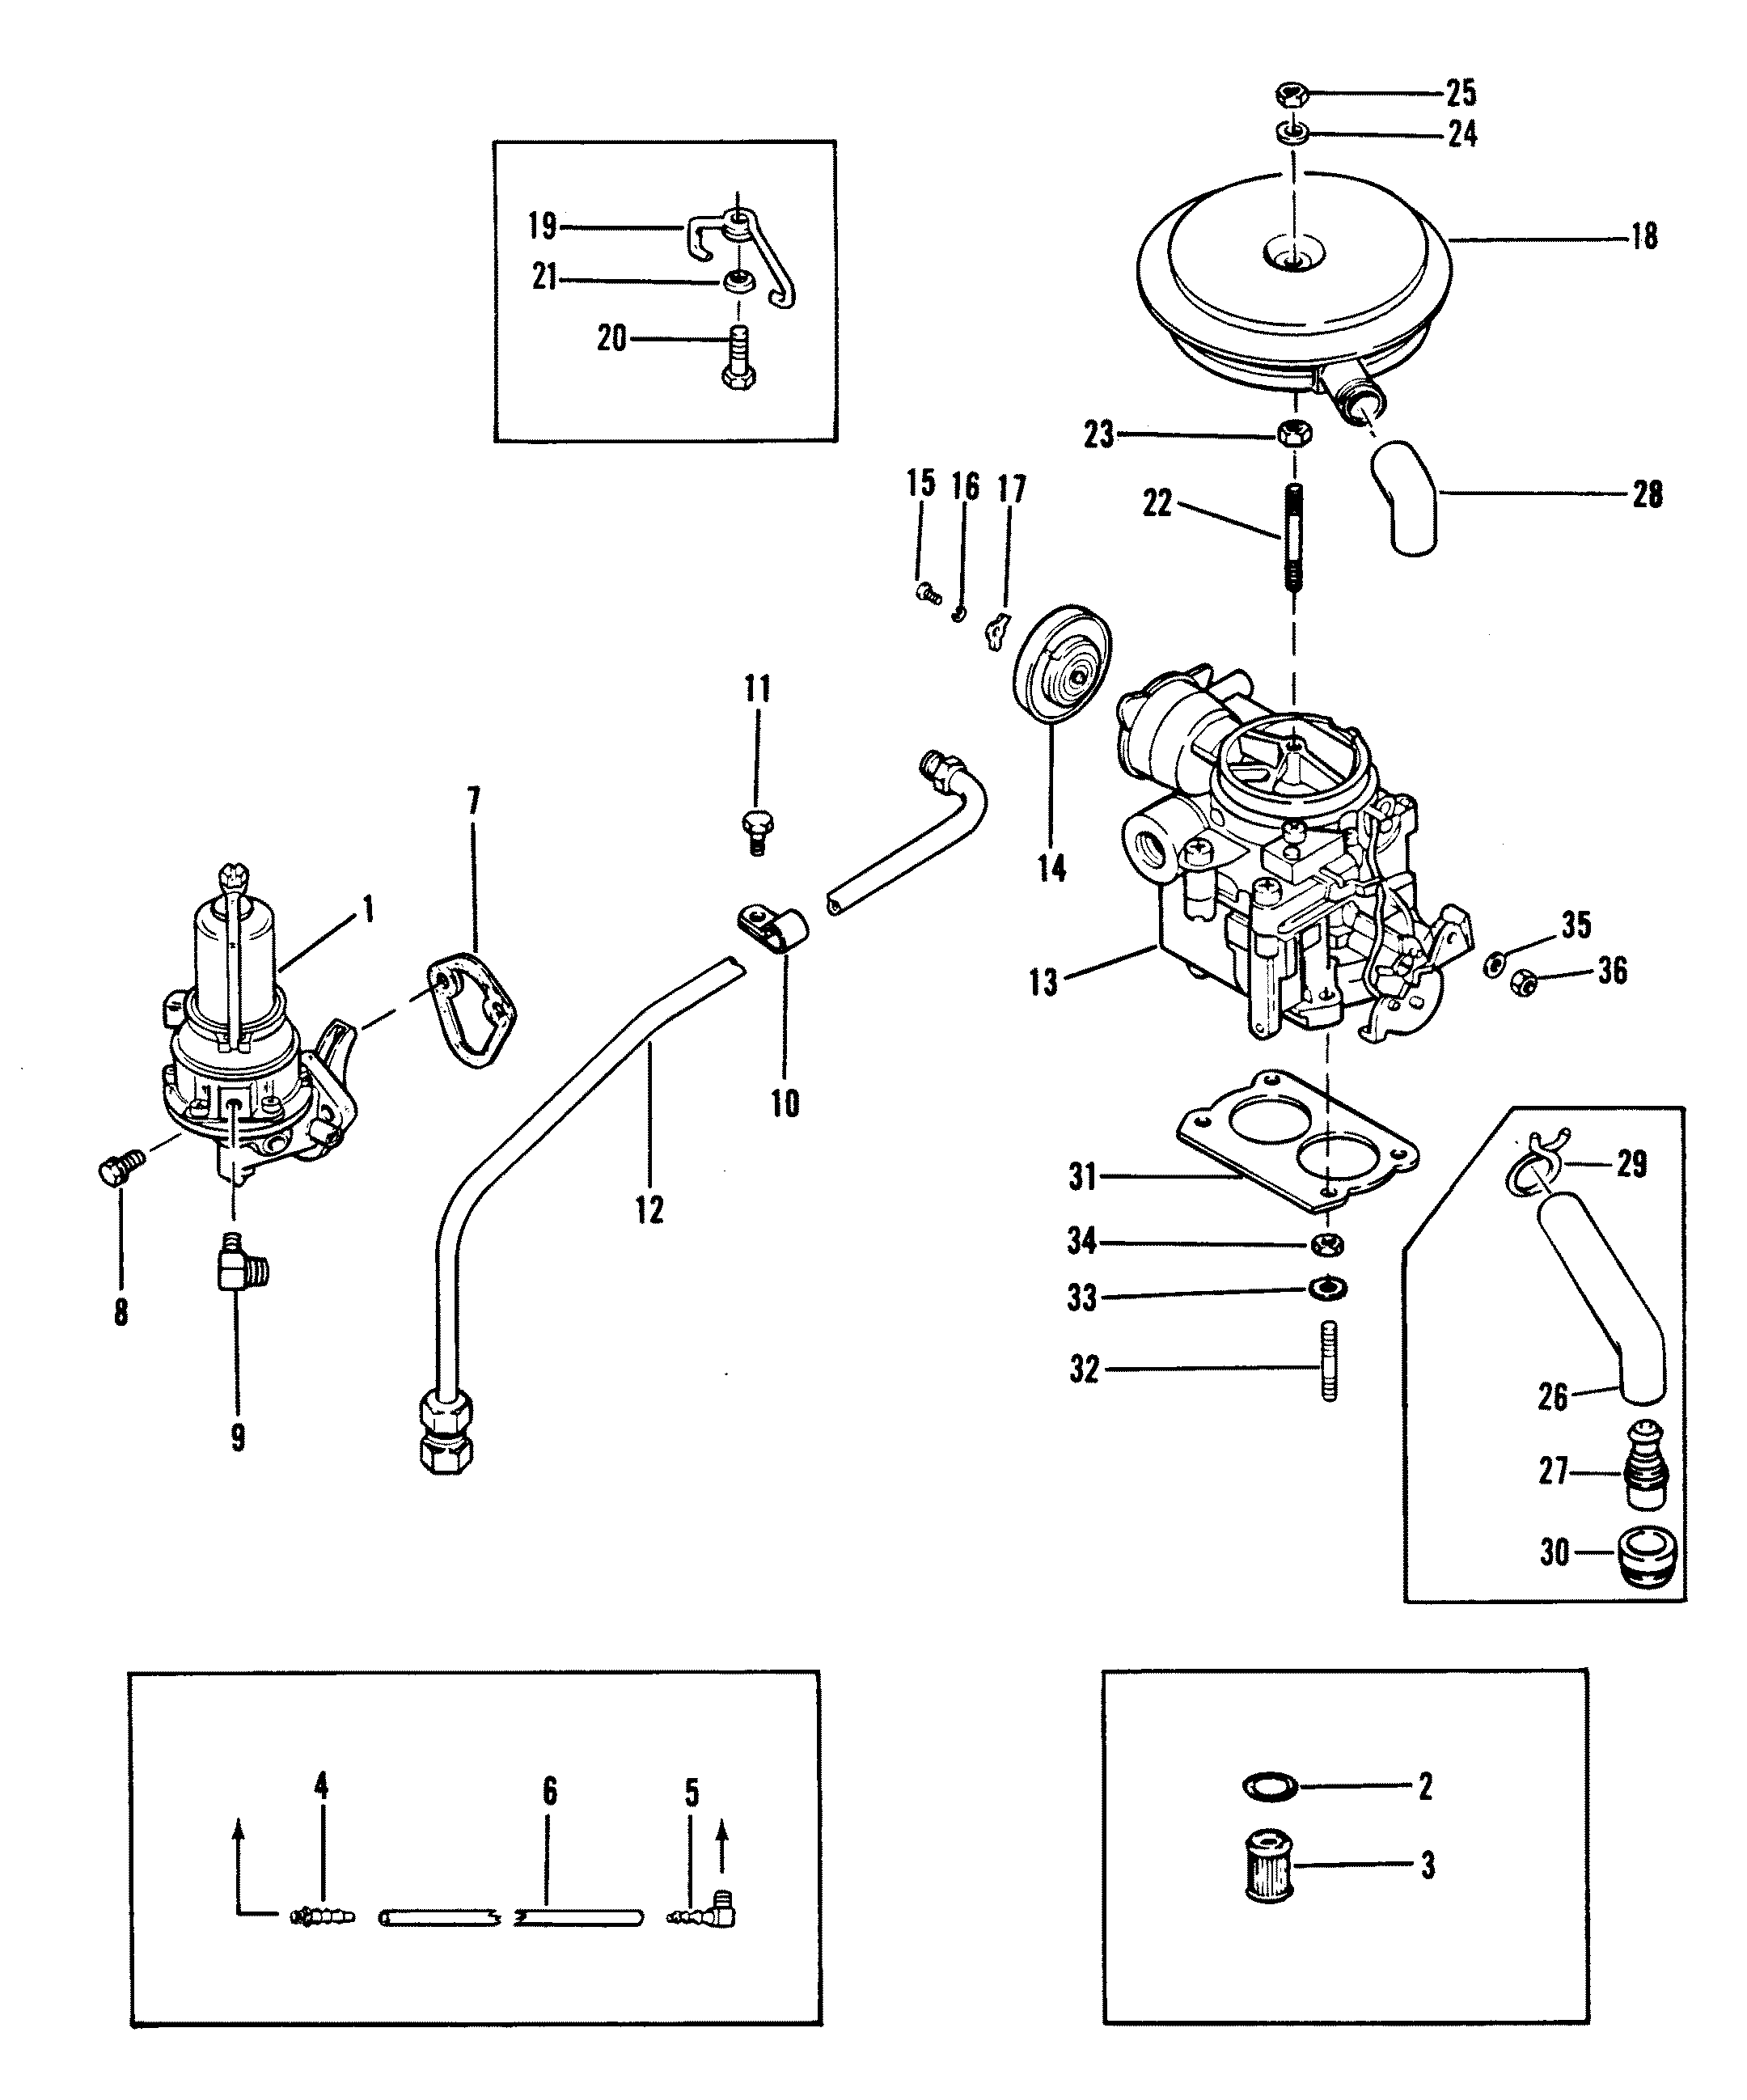 Mercruiser Inline 6 Wiring Diagrams. Diagram. Auto Wiring